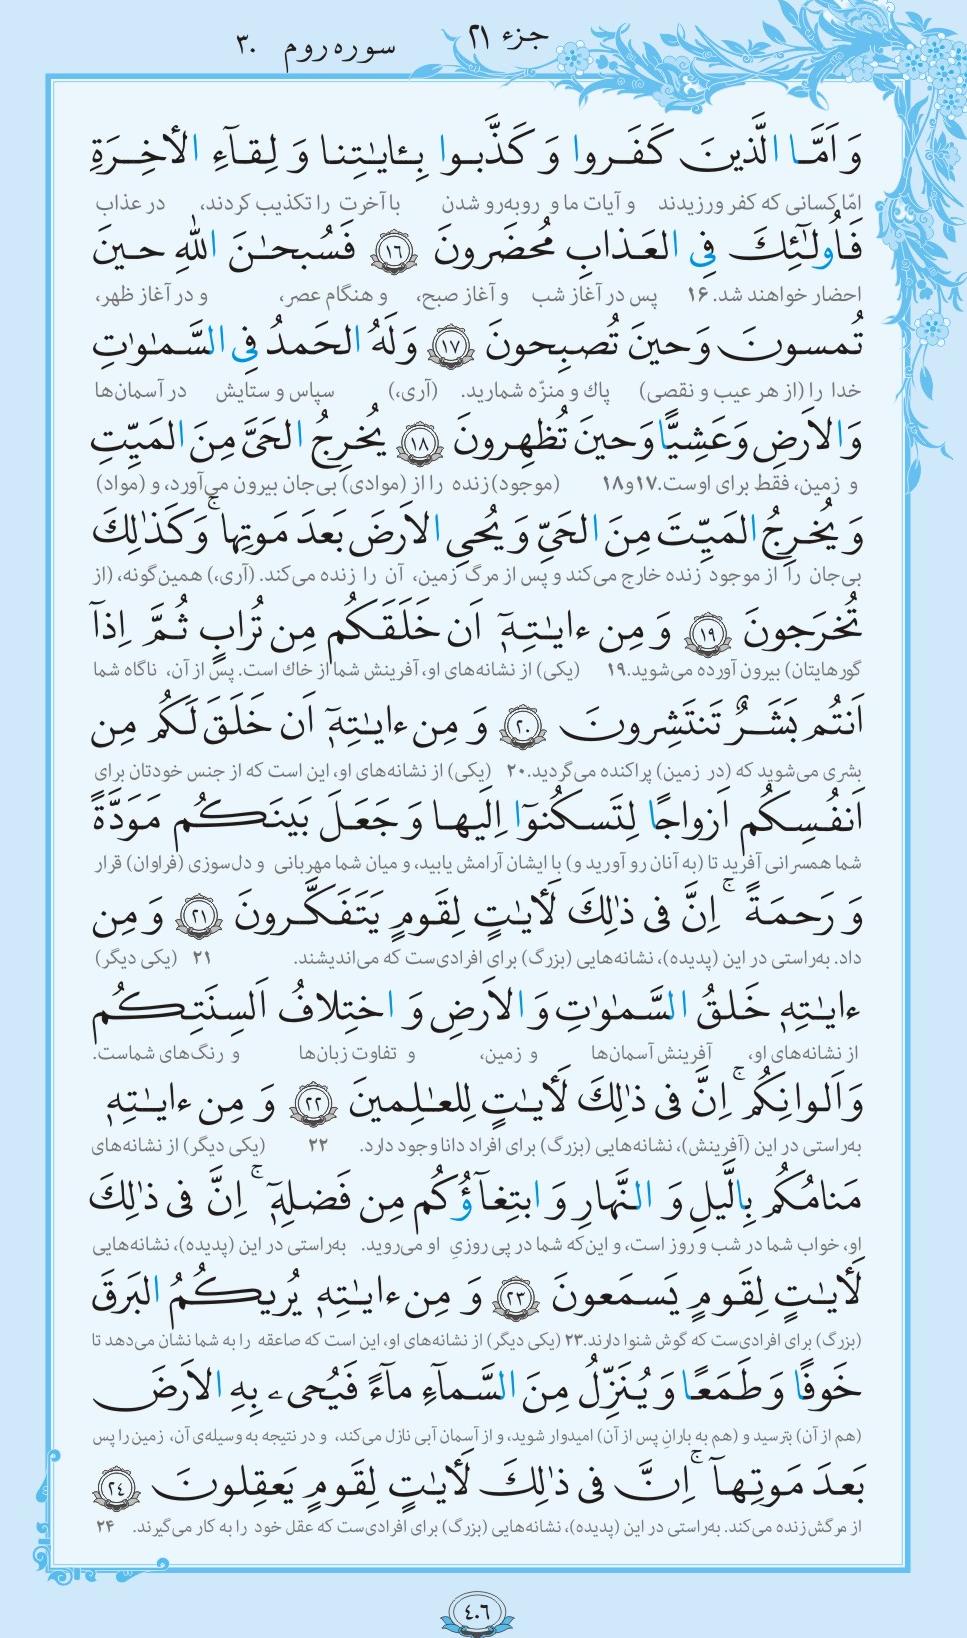 13990409000891 Test NewPhotoFree - ترتیل صفحه ۴۰۶ قرآن باصدای خلیل الحصری+صوت و متن